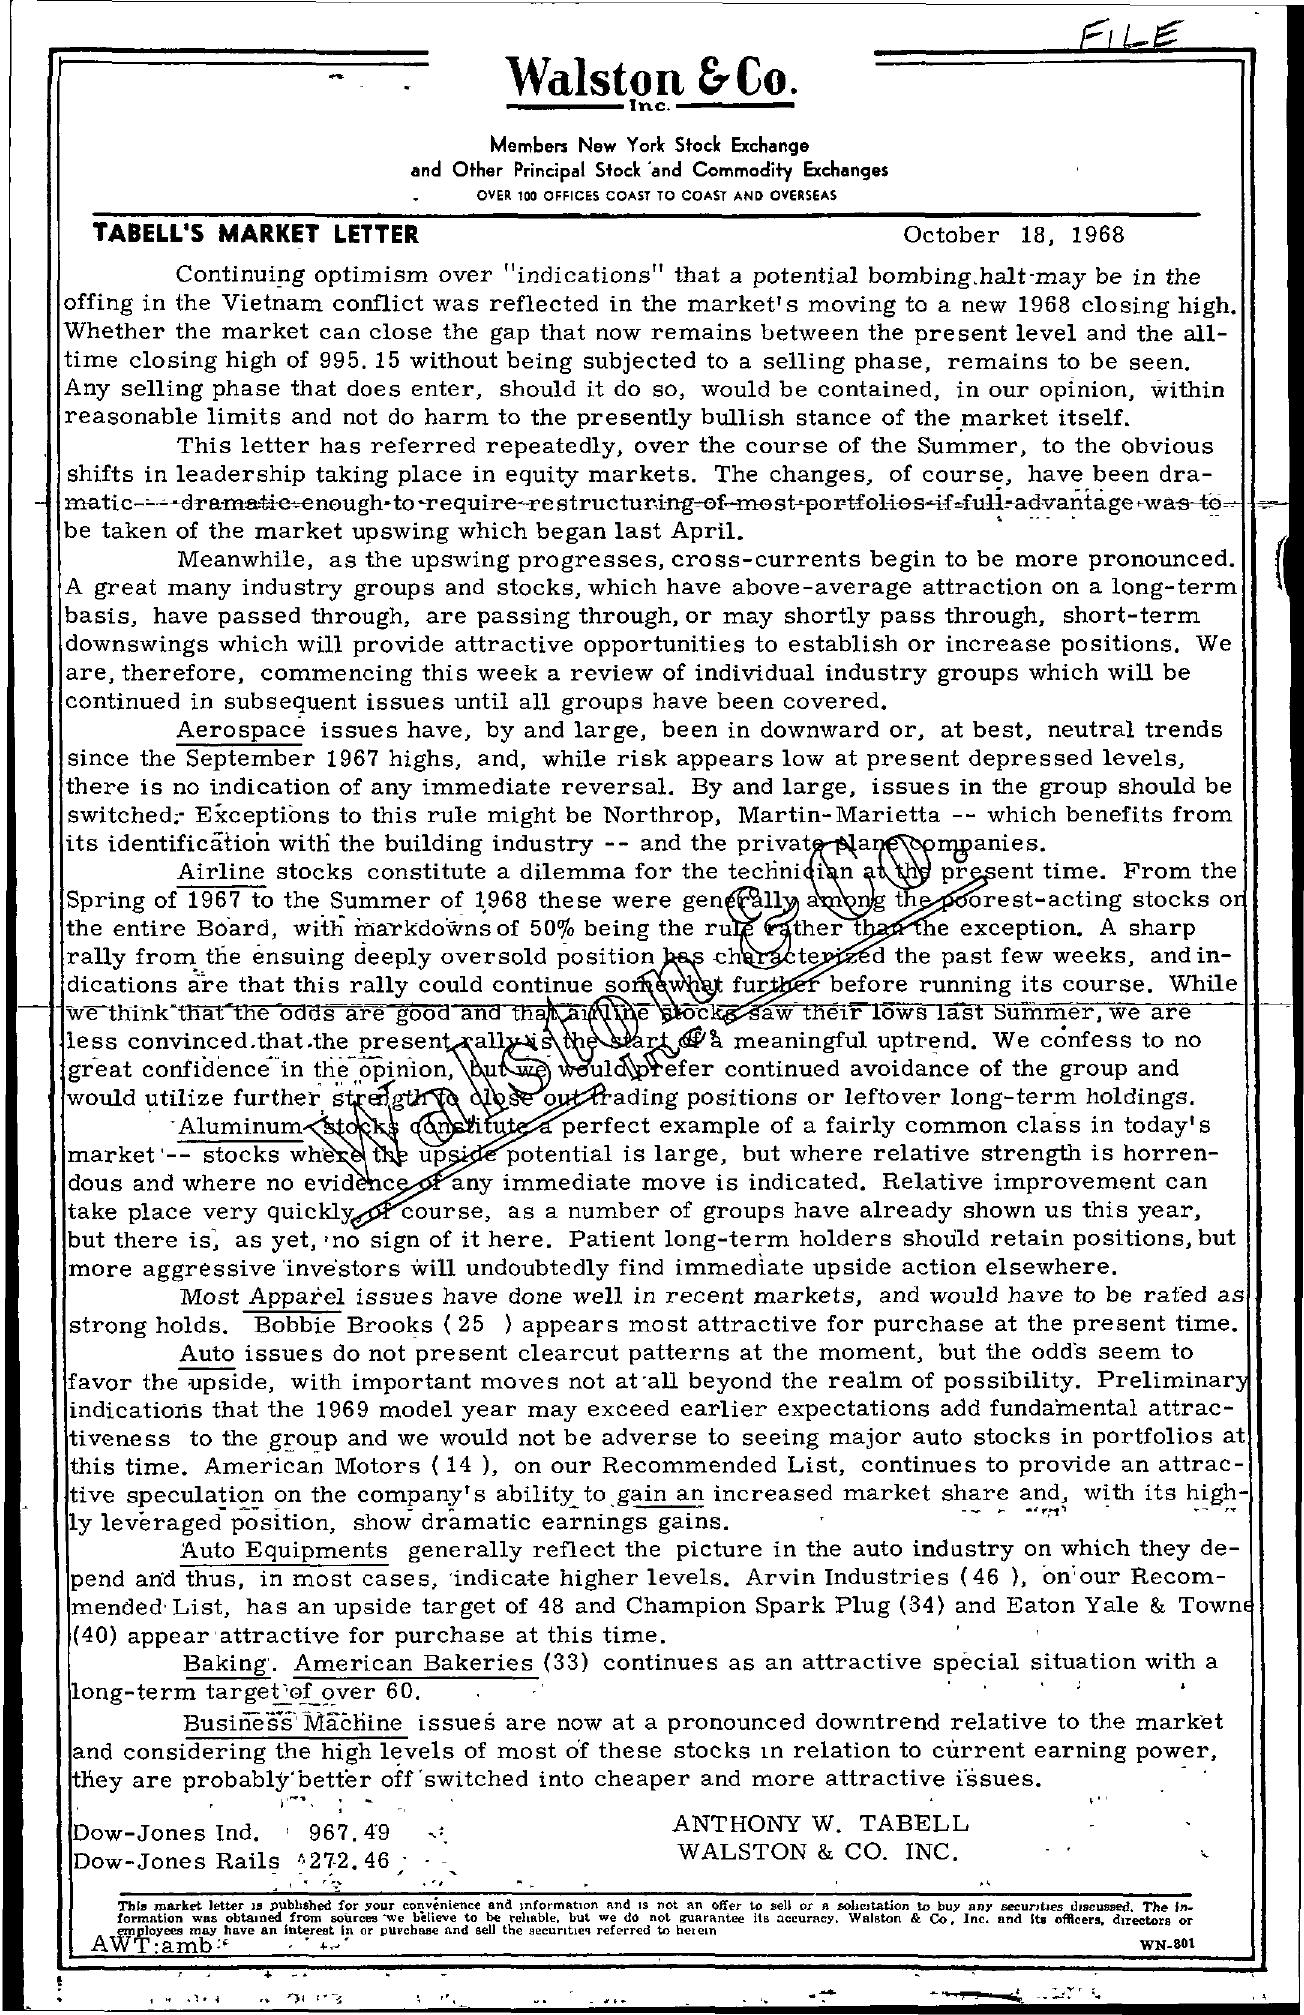 Tabell's Market Letter - October 18, 1968